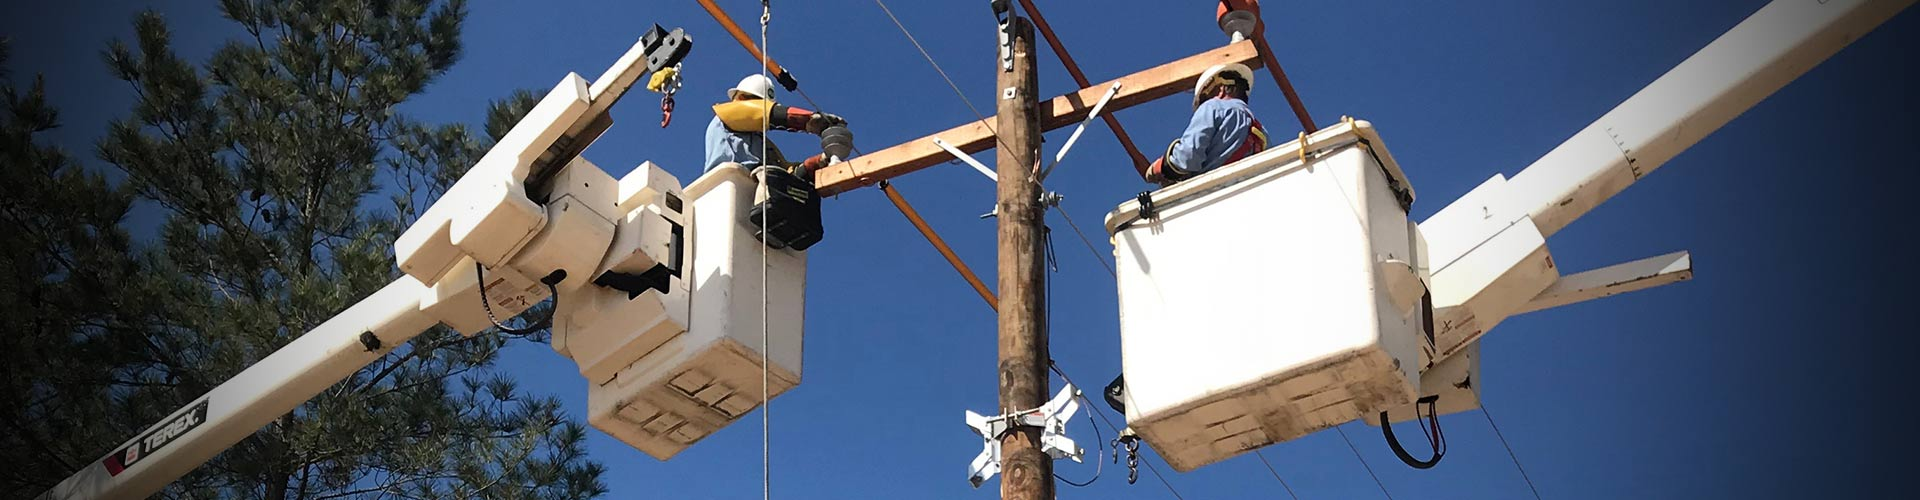 C&L Electric Cooperative - Star City, Arkansas